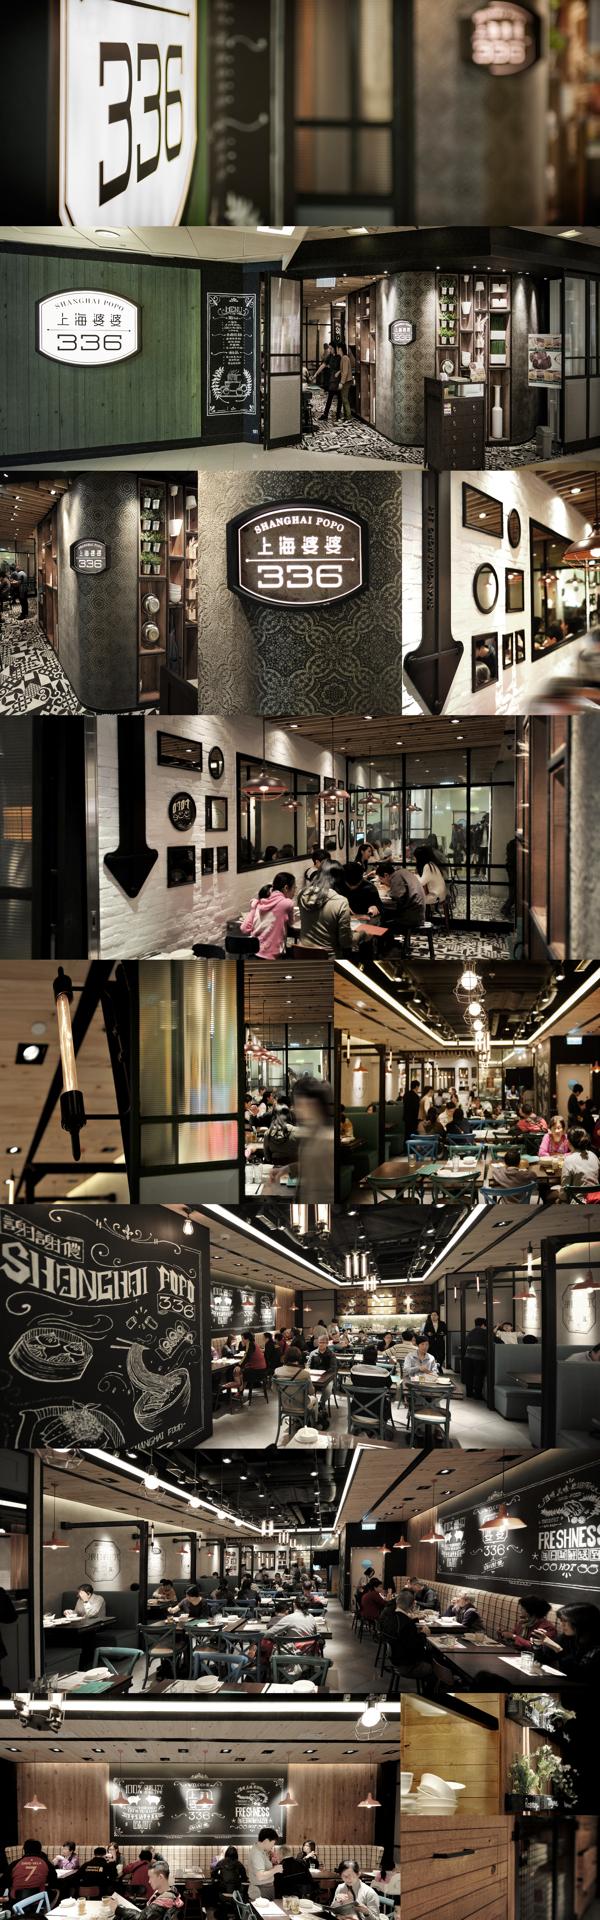 SHANGHAI POPO 336 (East Point City) on Behance